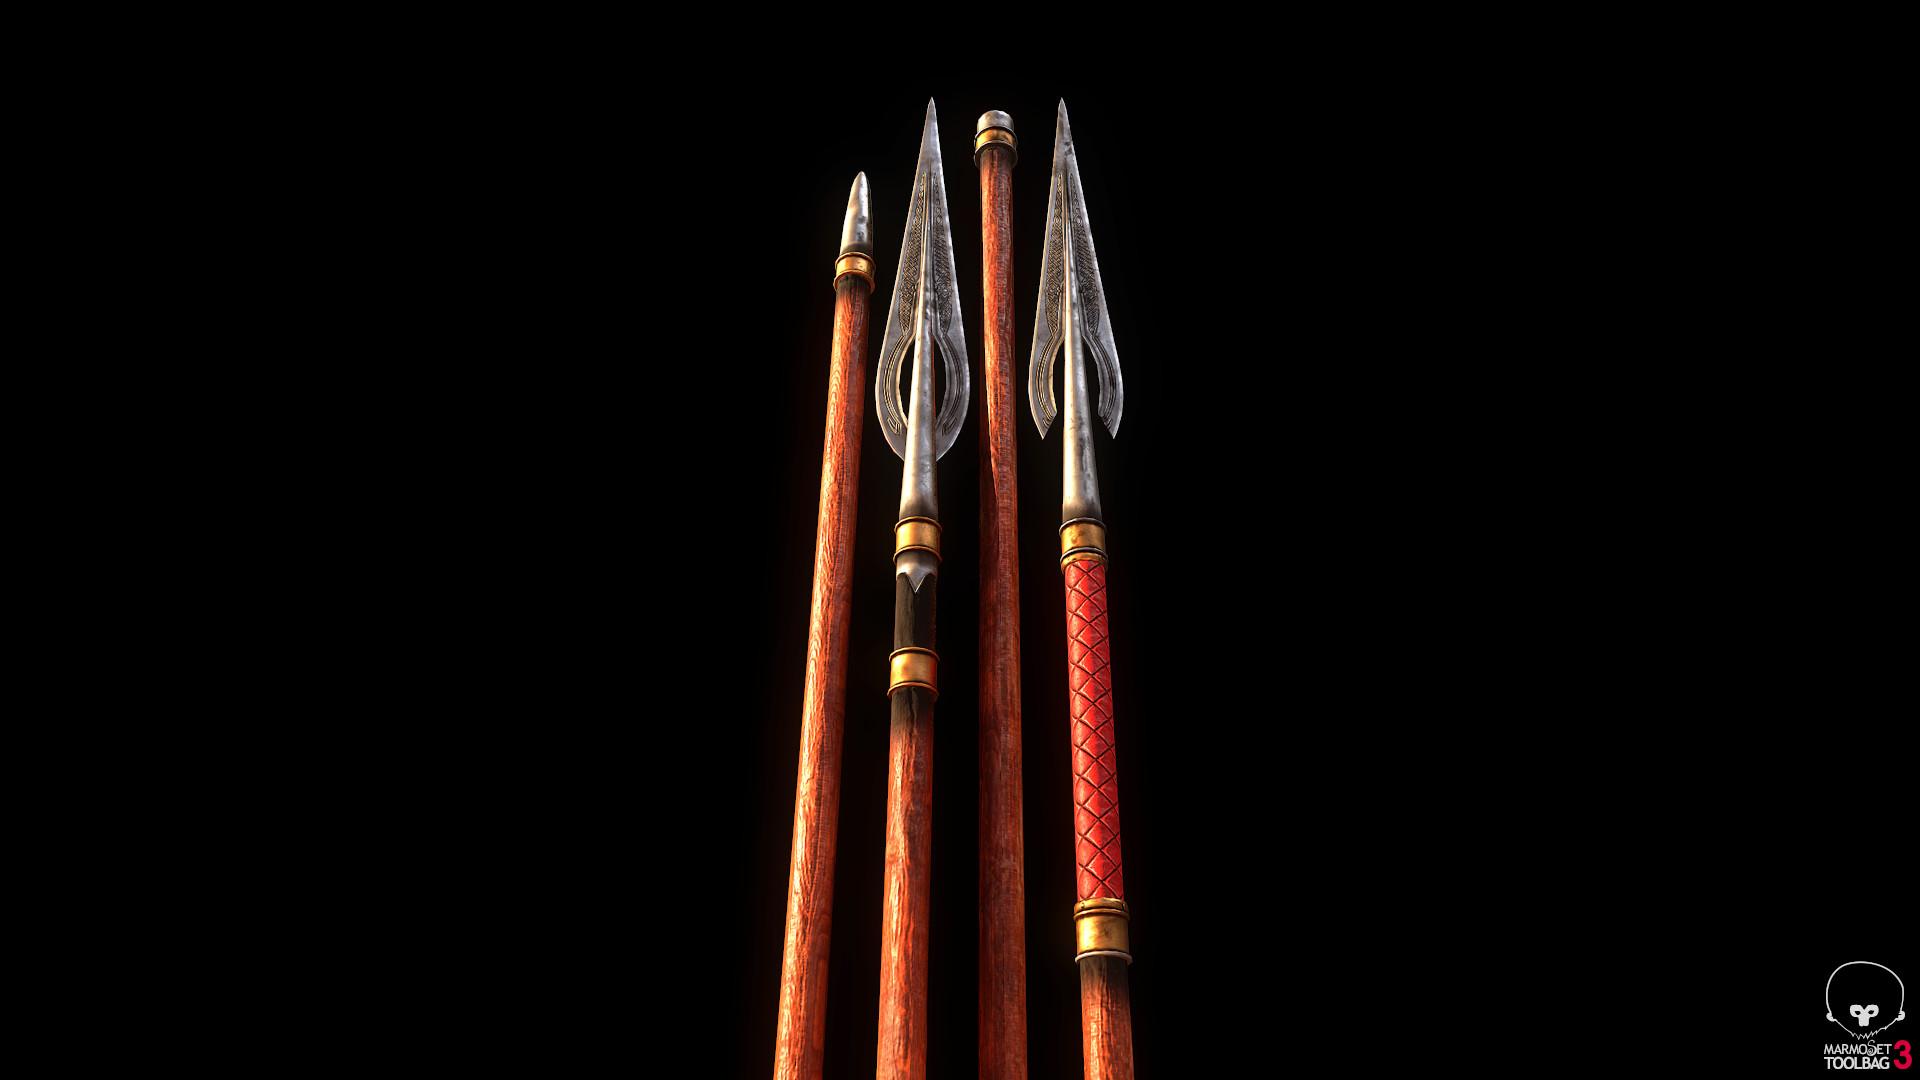 Bela csampai s4h rohan spear ornate 01 render mt 01